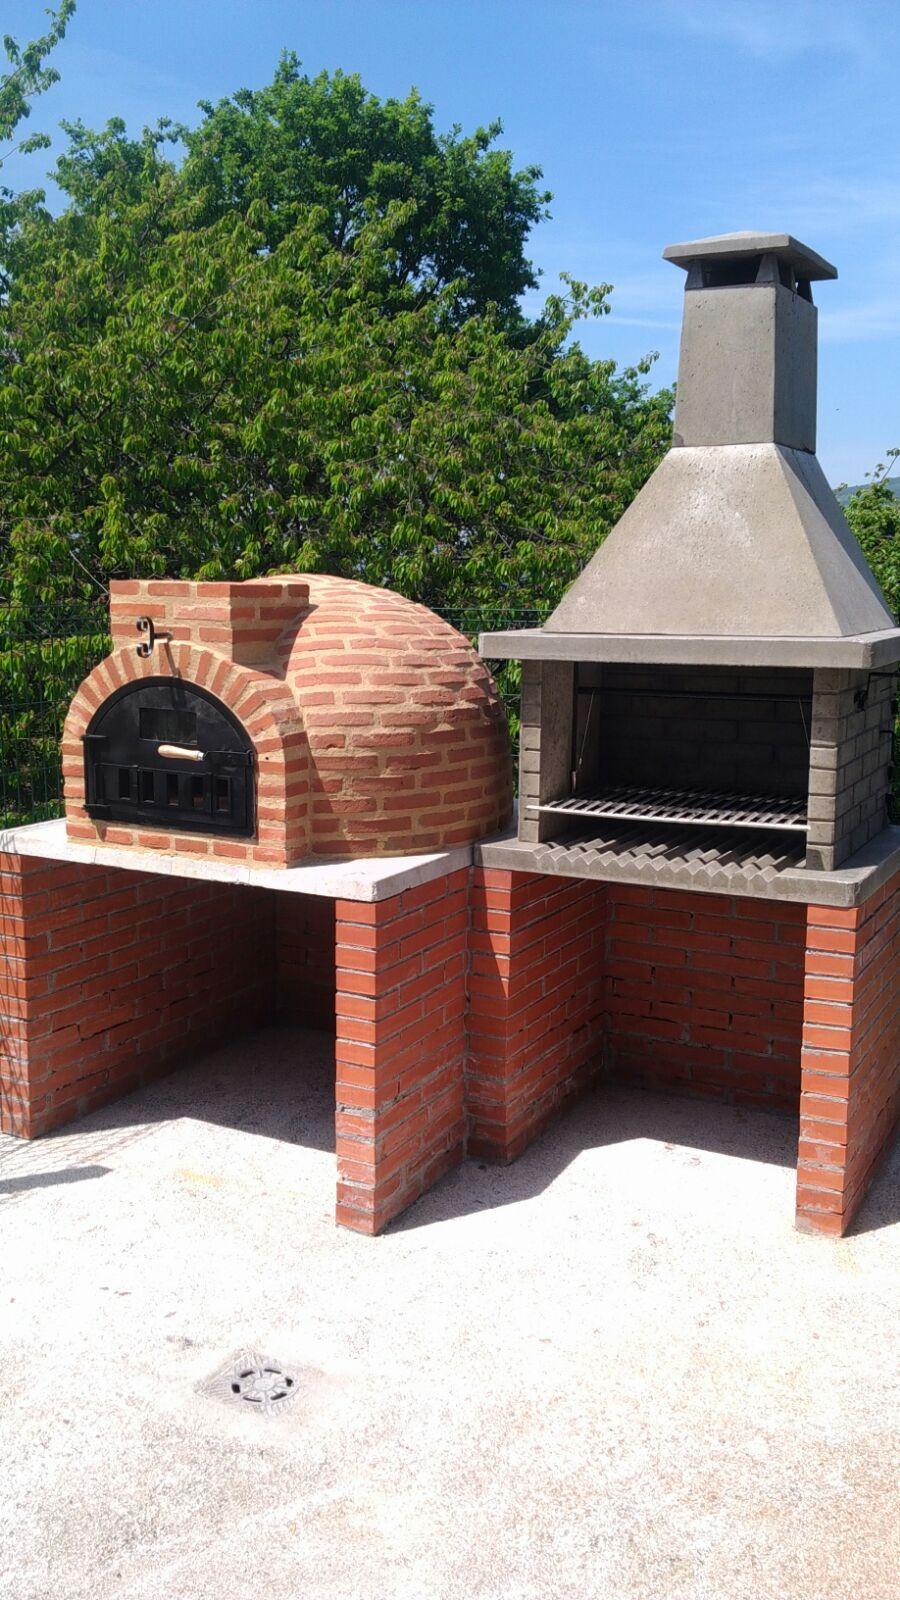 Montaje horno de le a de pereruela y barbacoa de granito patio horno de le a horno y le a - Horno de lena y barbacoa ...